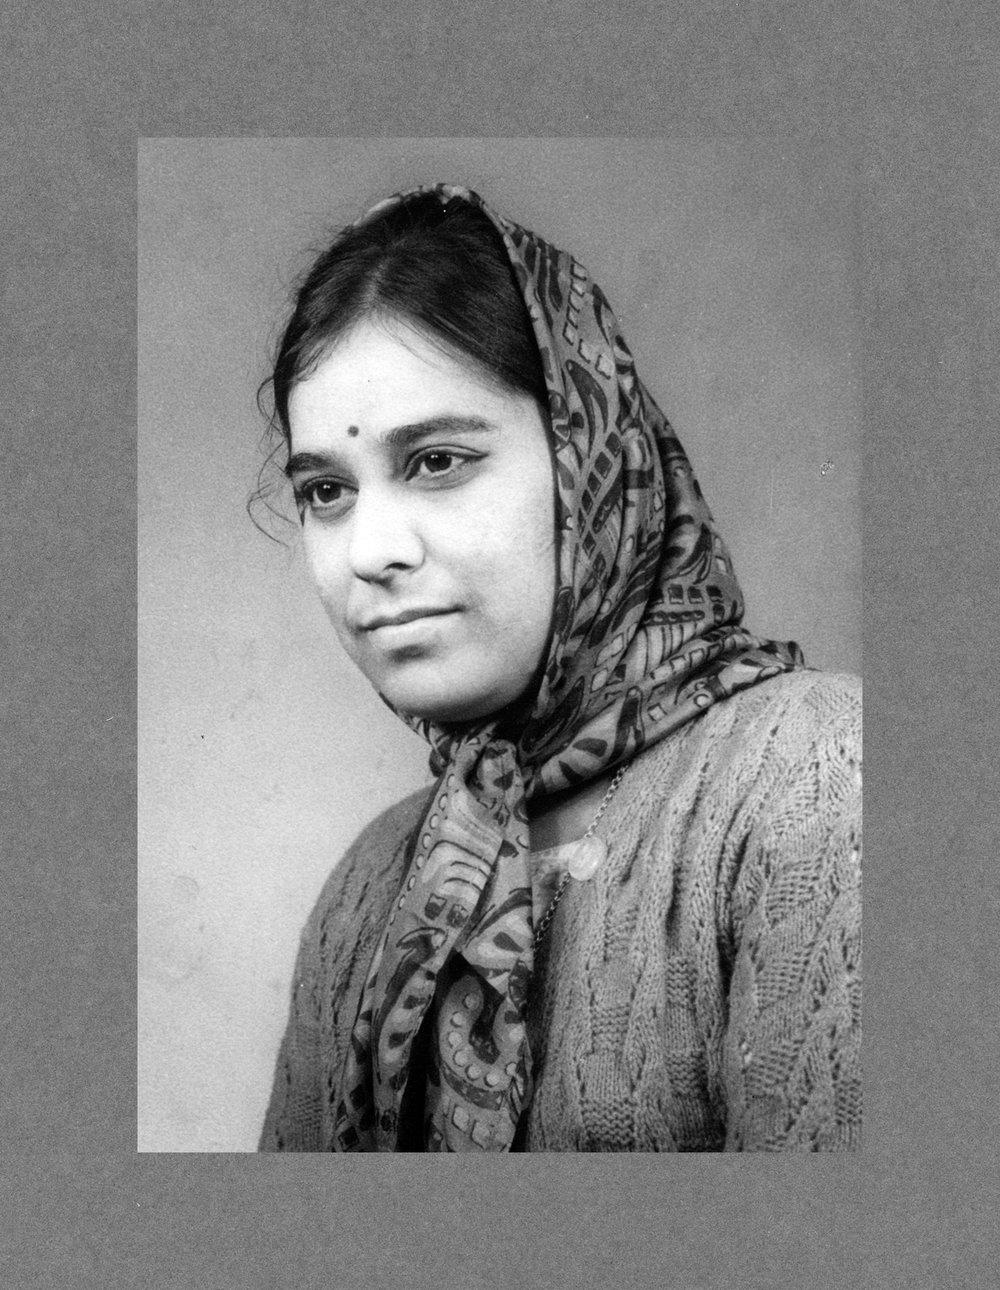 Punjab, India c.1972